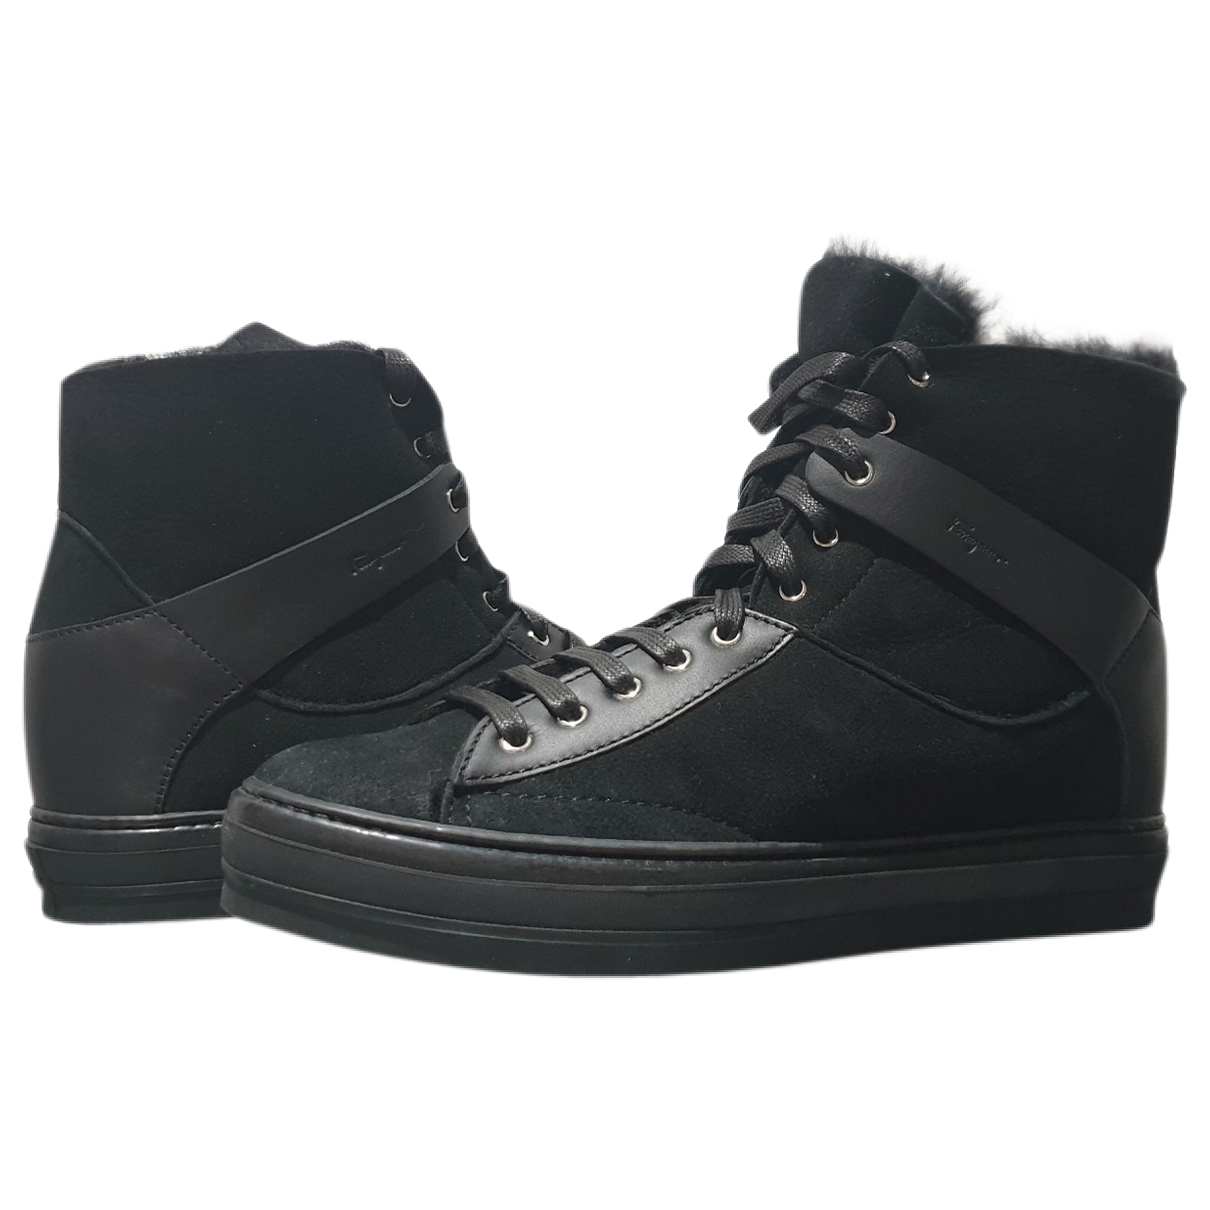 Salvatore Ferragamo \N Sneakers in  Schwarz Veloursleder